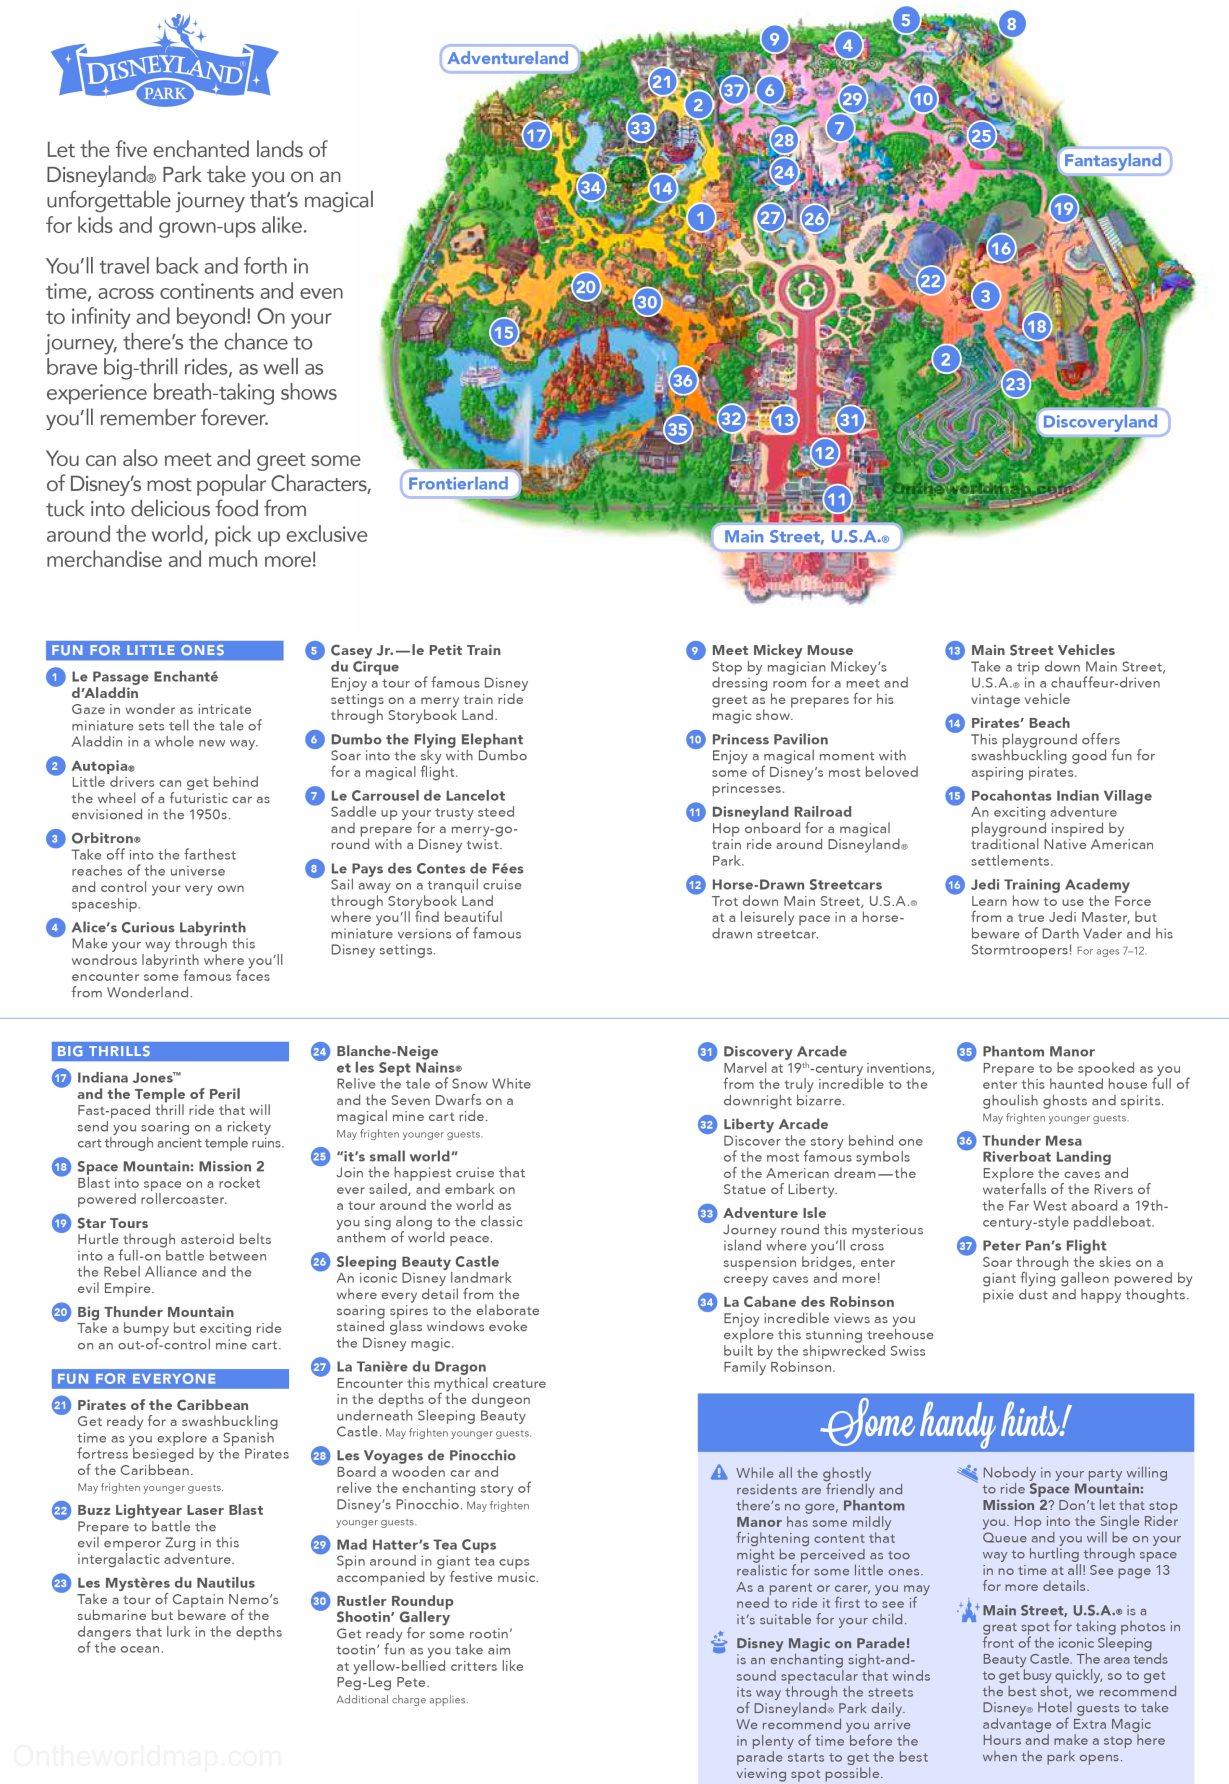 Disneyland Paris Karte 2018.Map Of Disneyland Paris